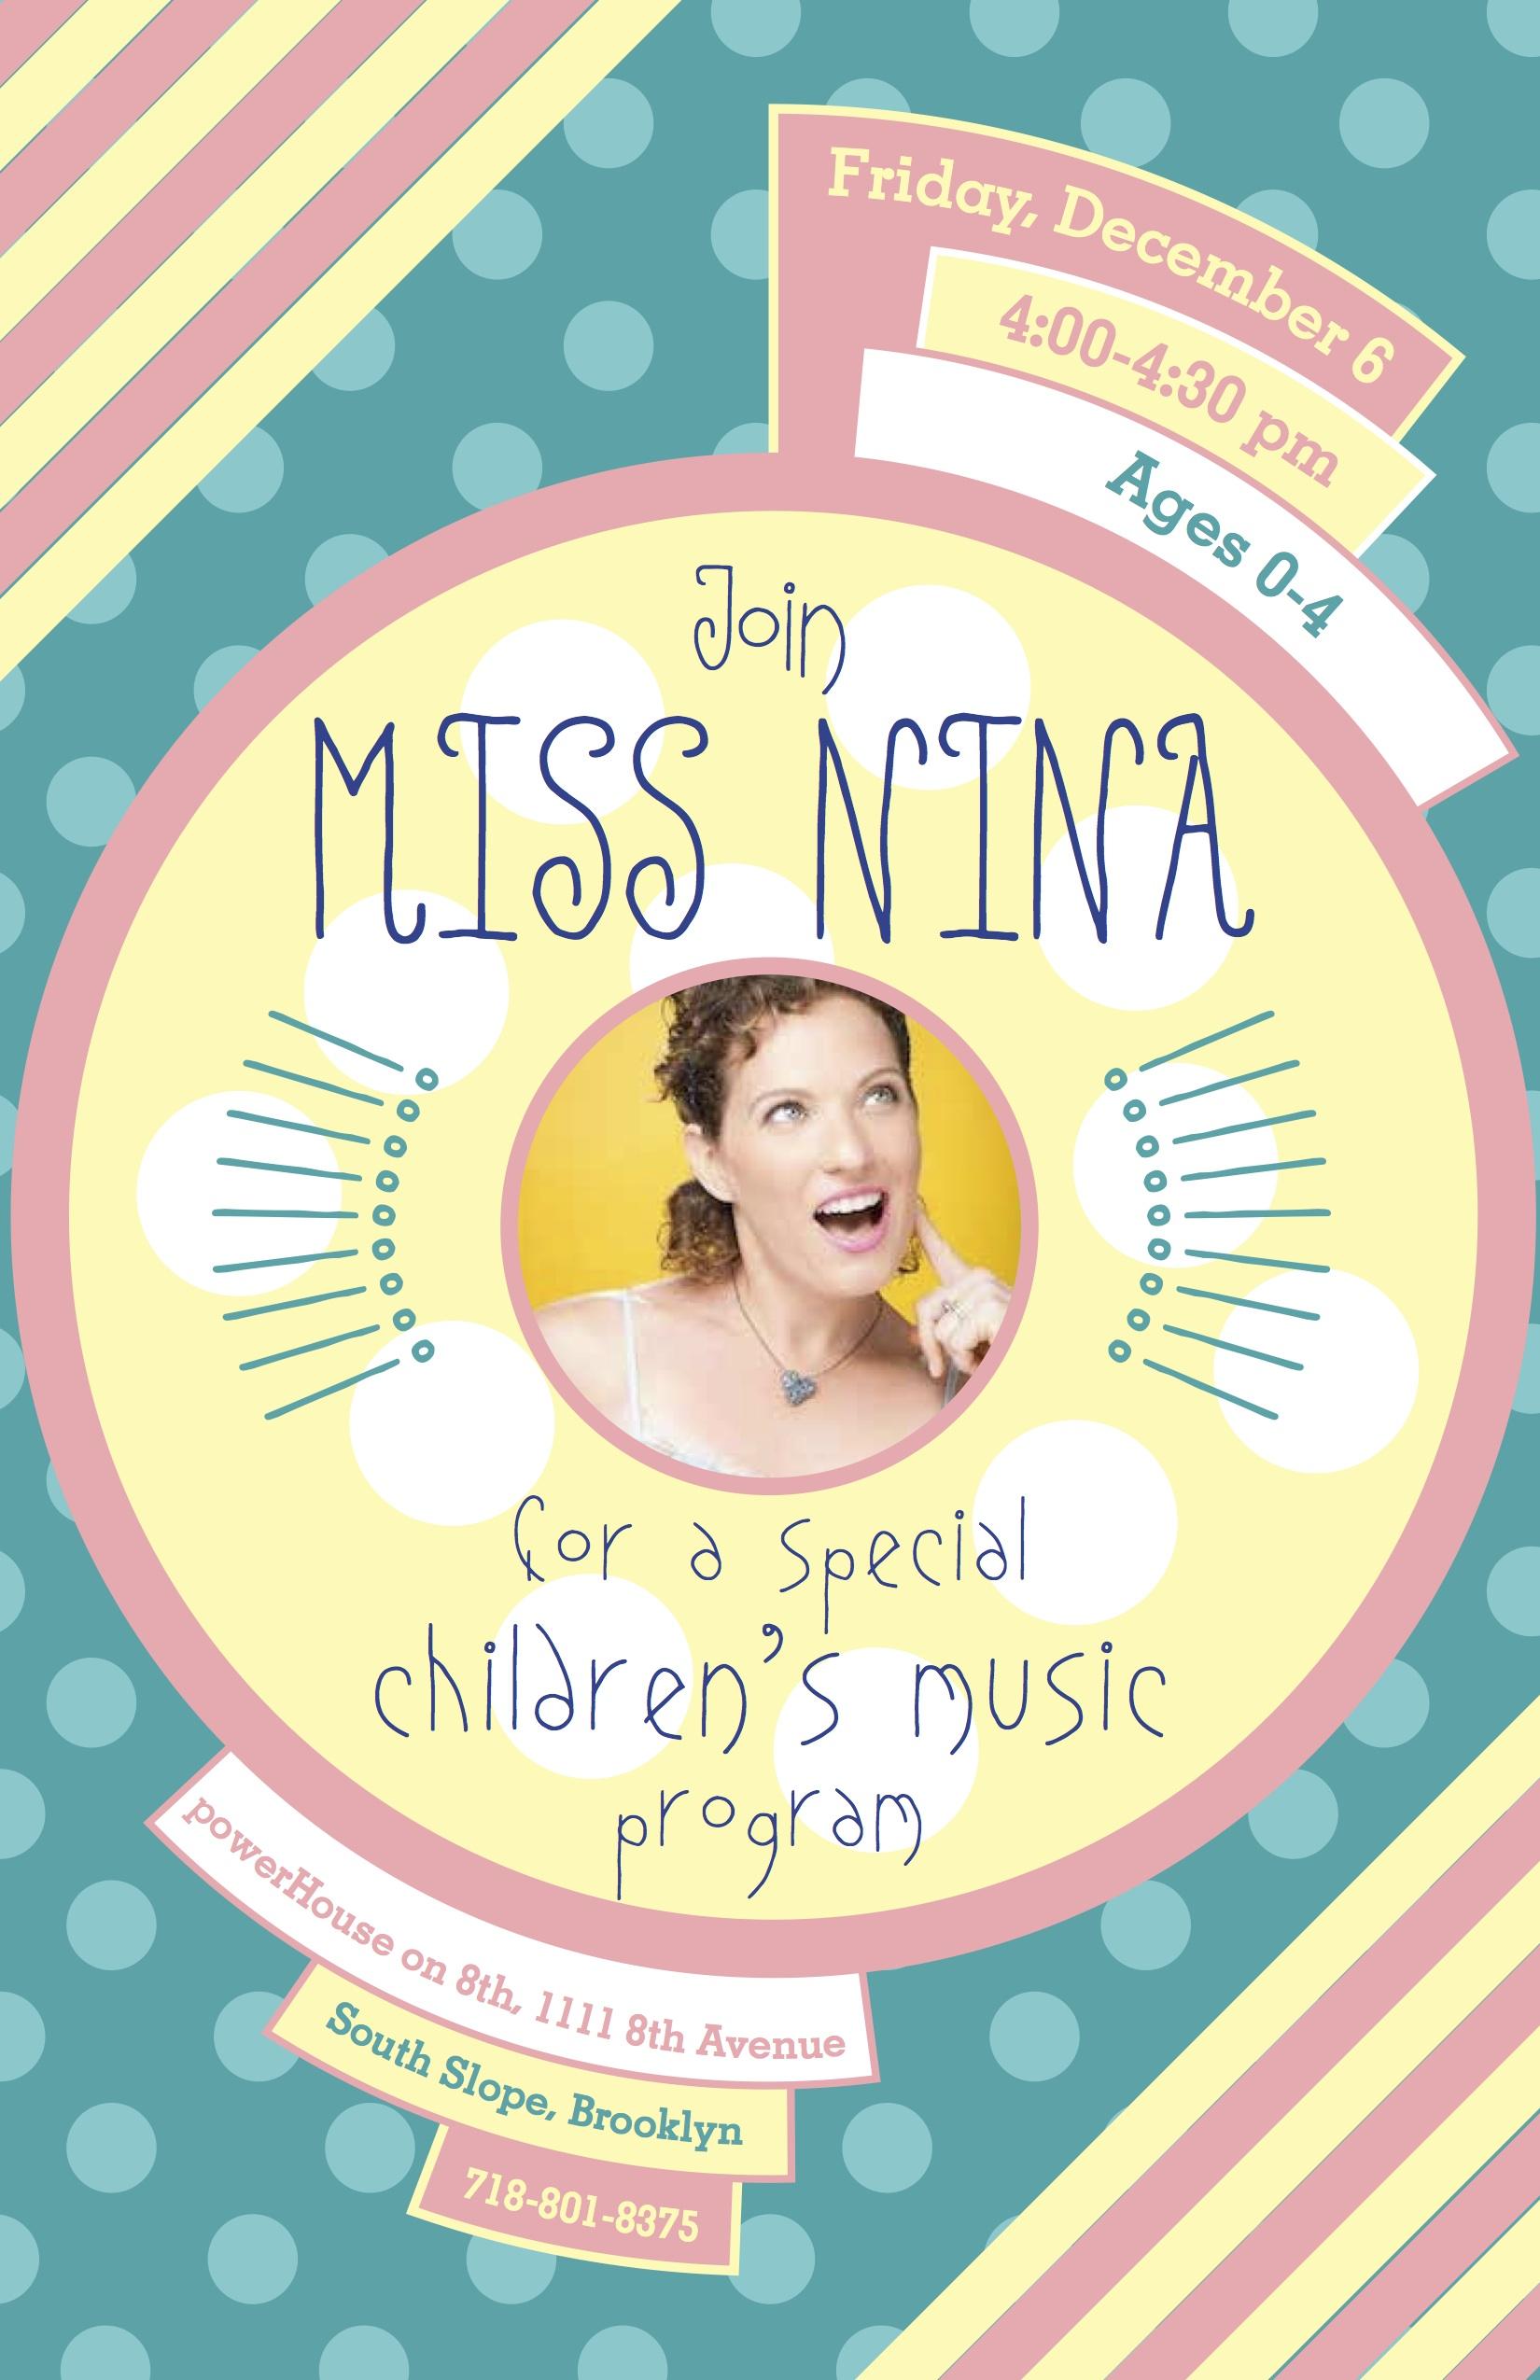 Sing-Along with Miss Nina